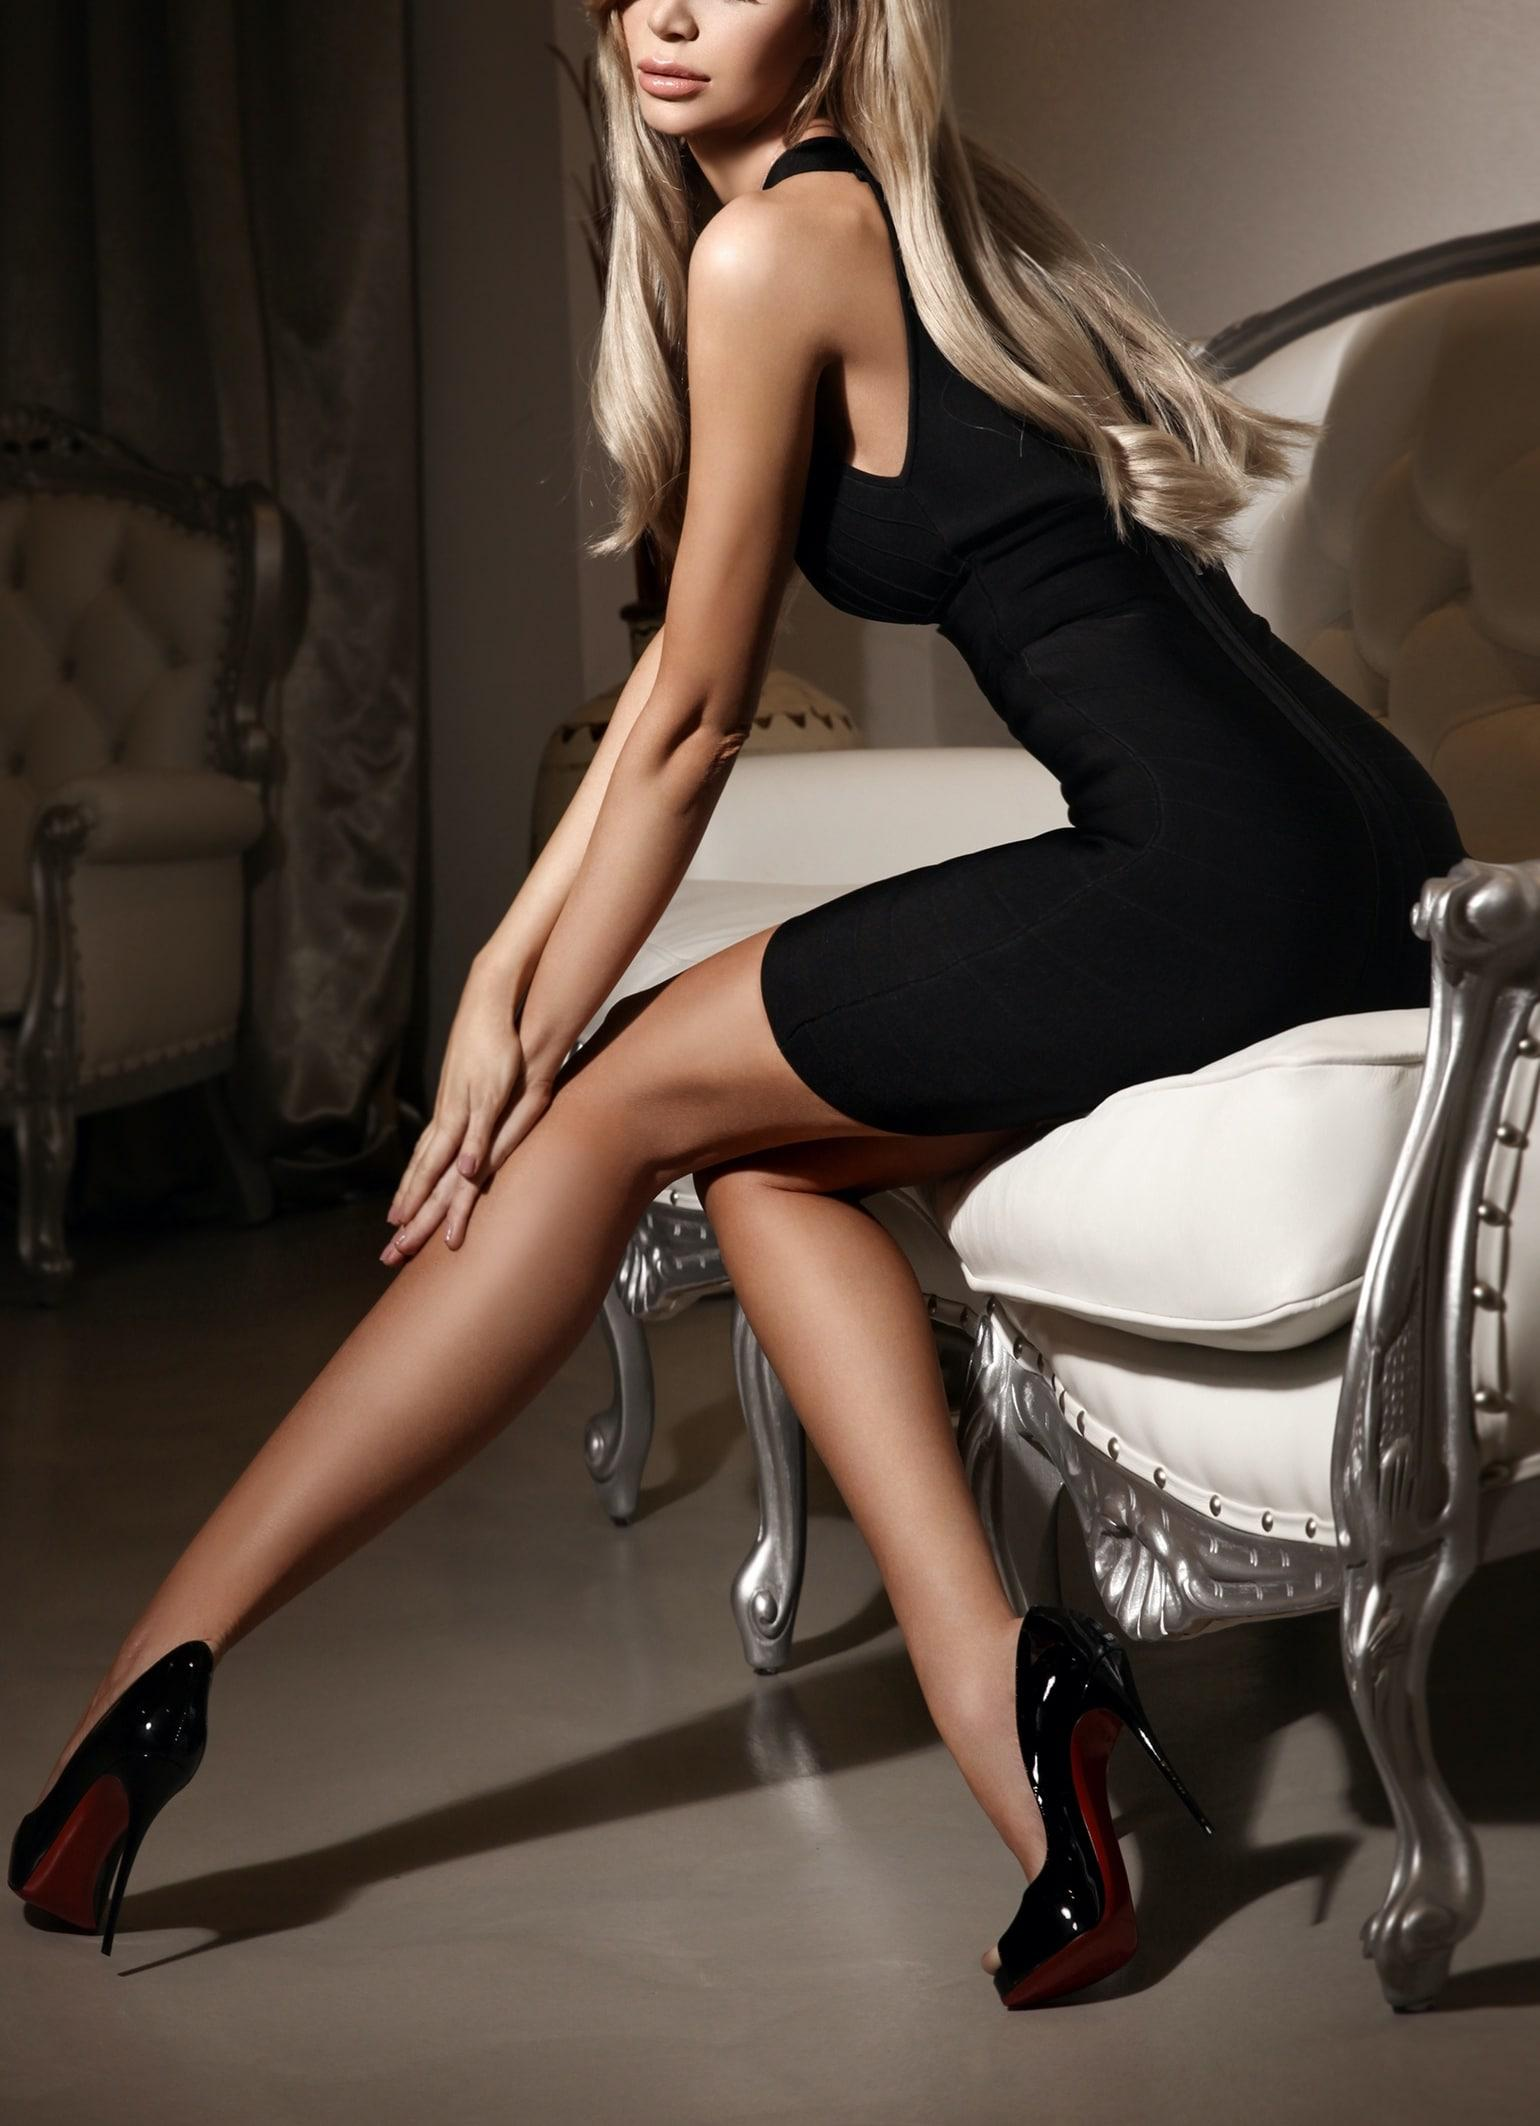 Megan from London Leading Ladies